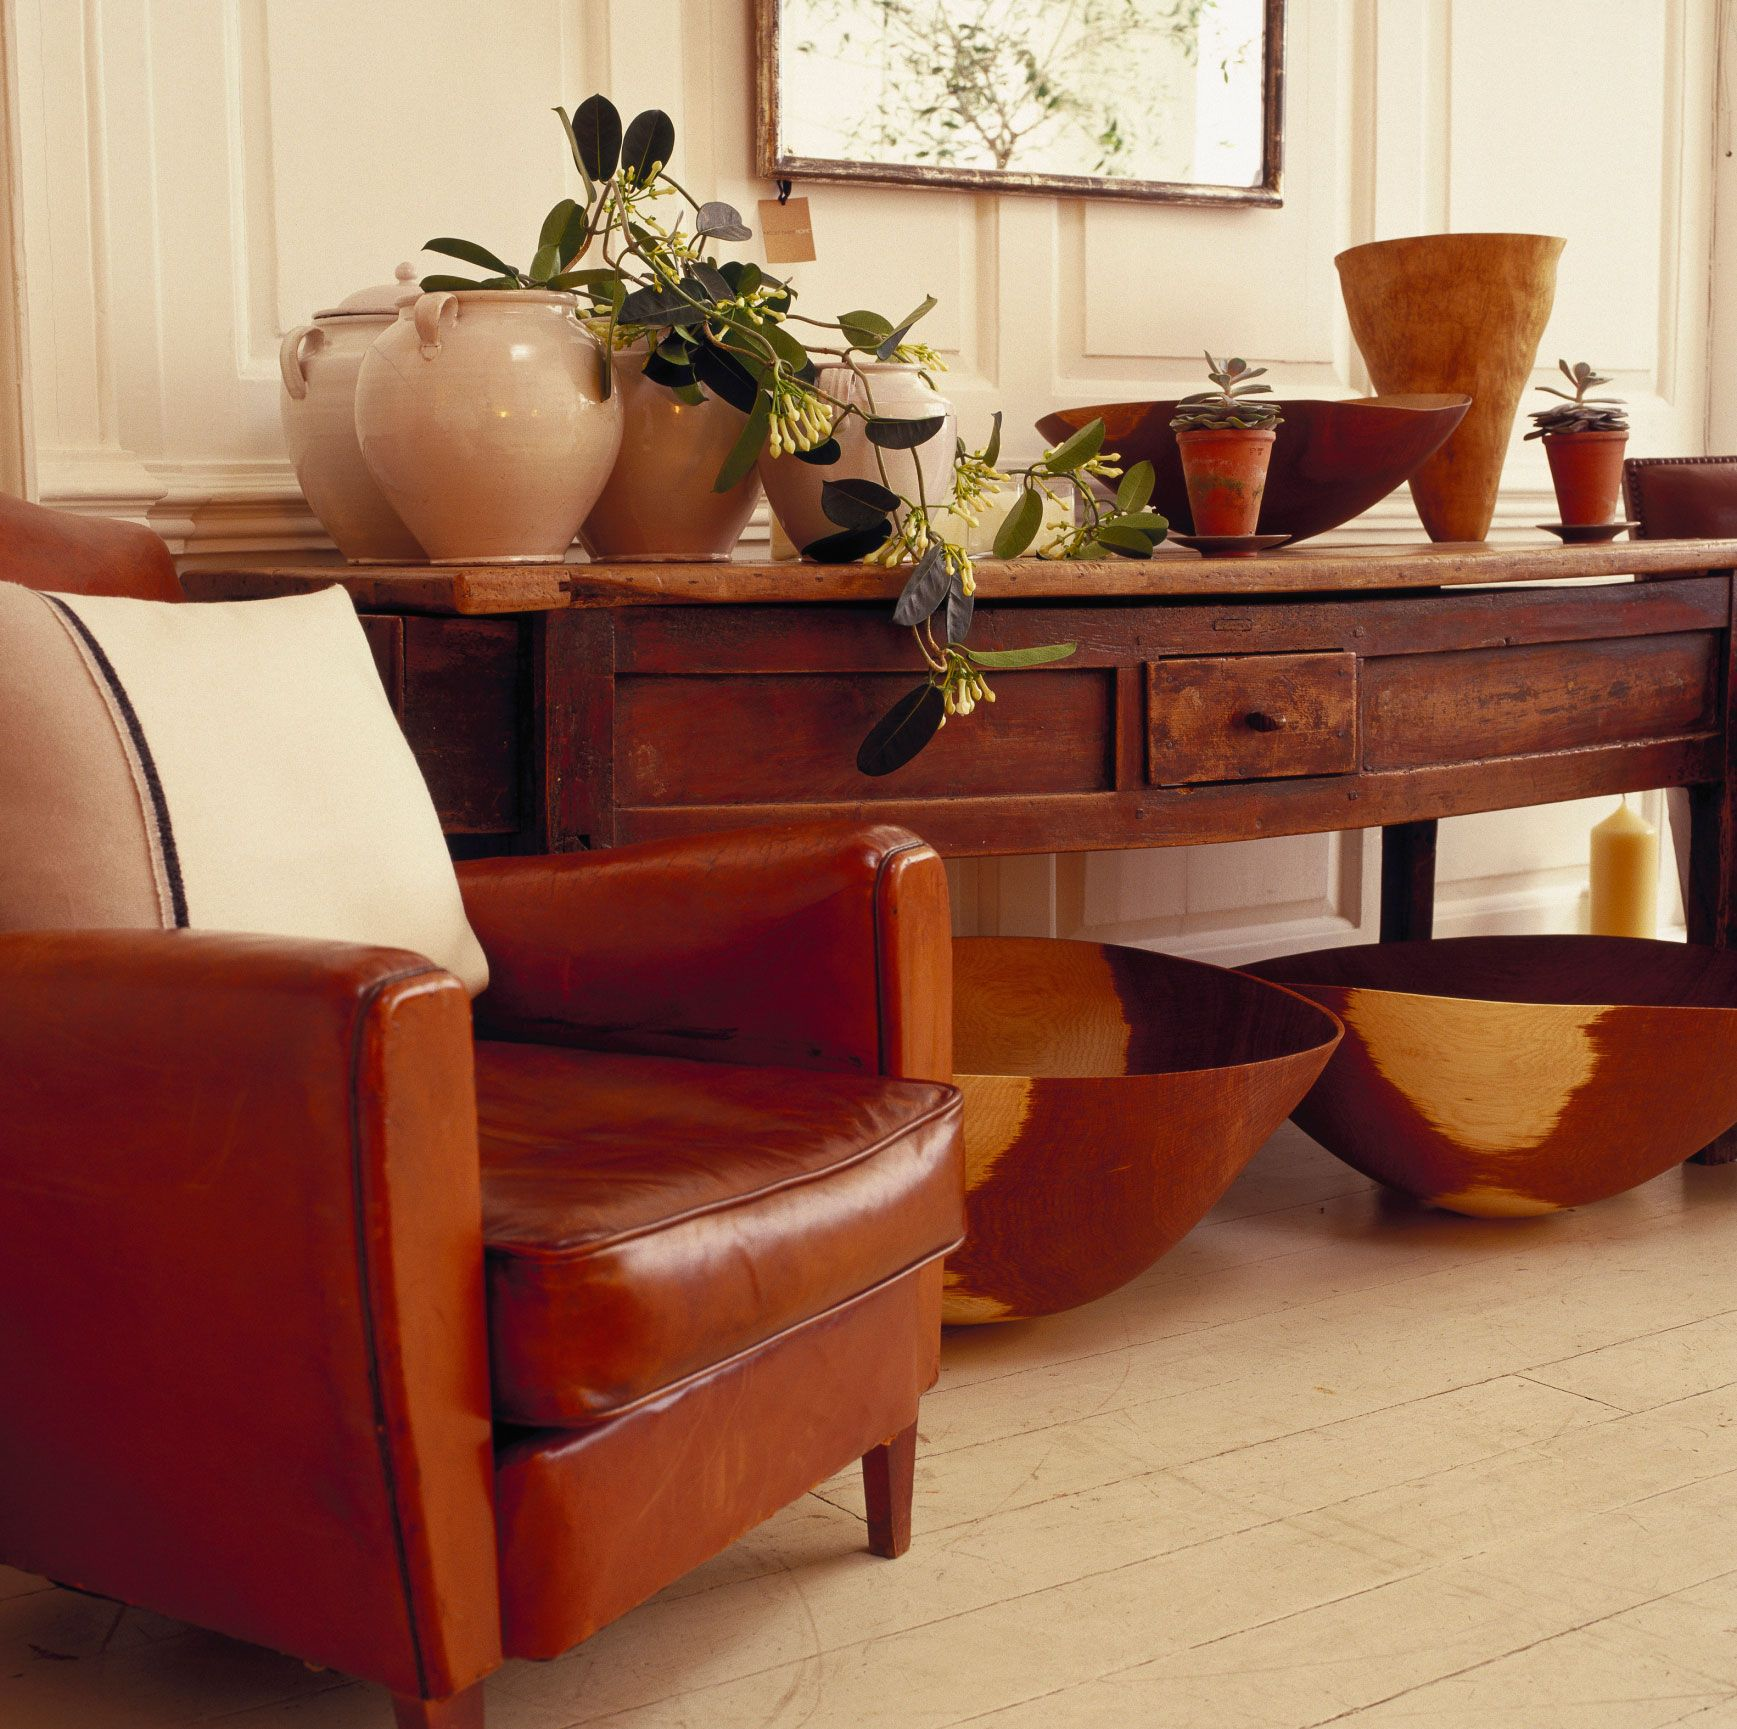 Muebles de estilo vintage hogarmania - Muebles estilo vintage ...